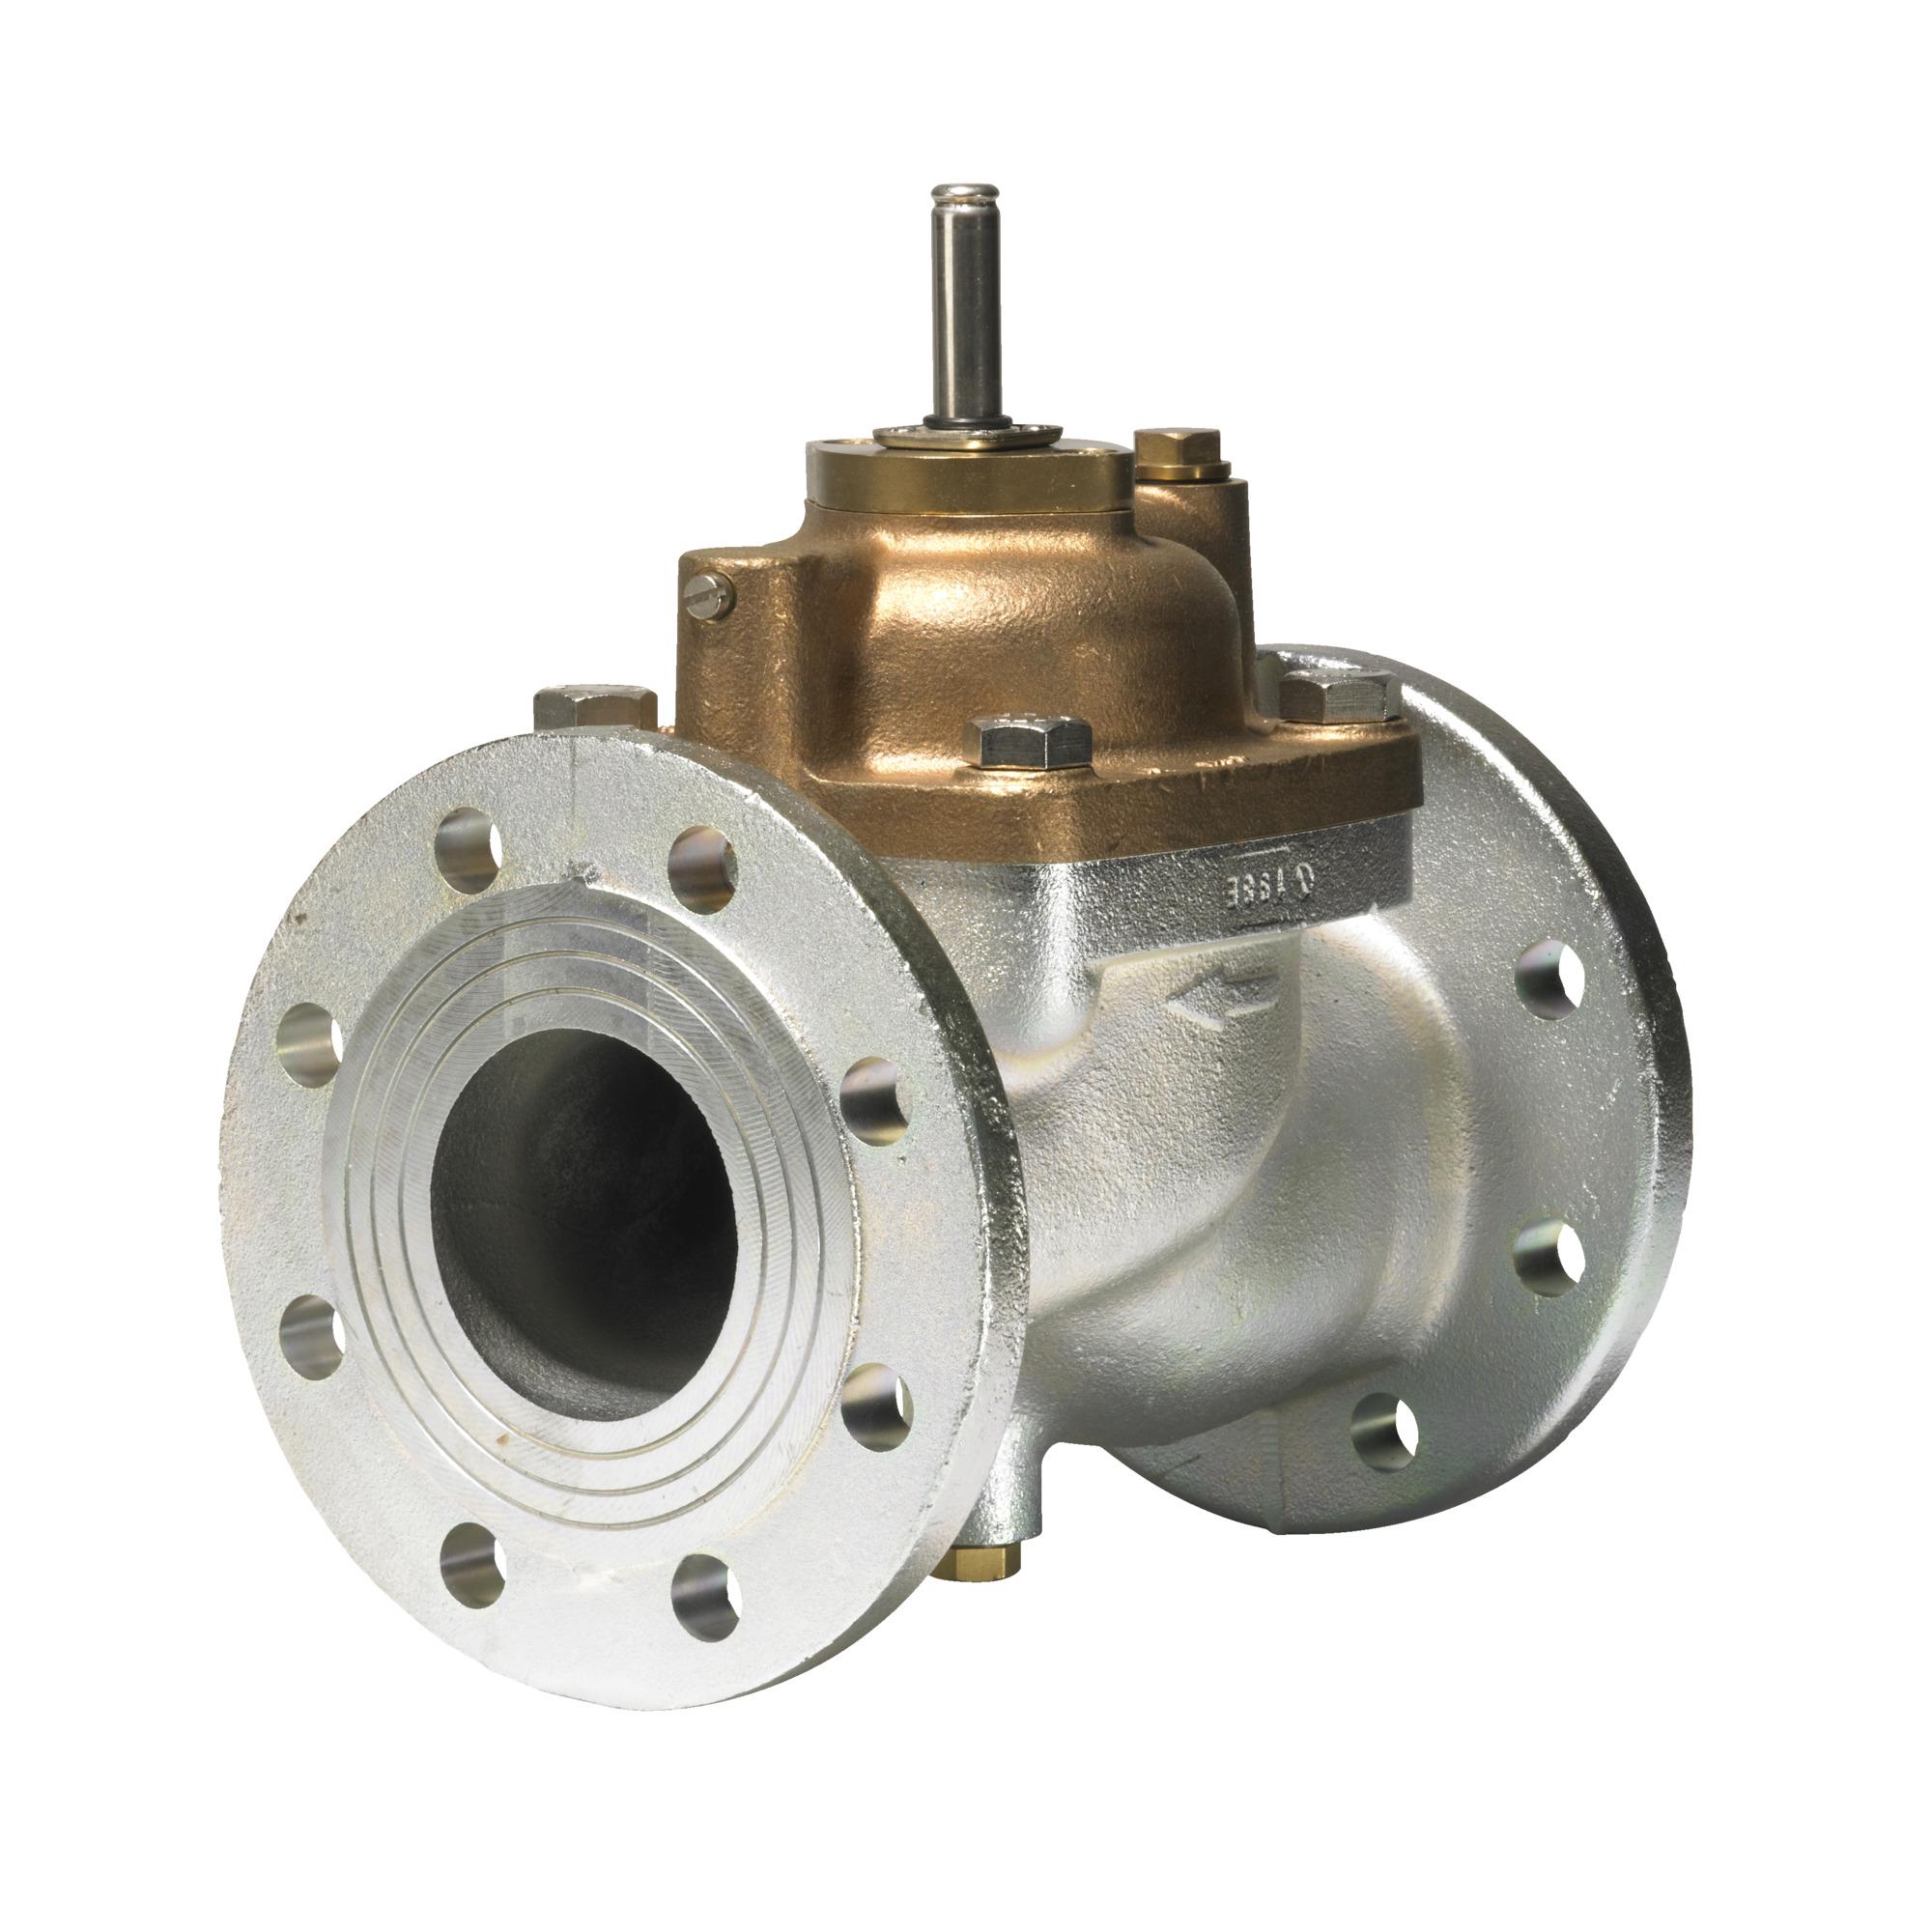 EV220B, Электромагнитный клапан, Фланец, Нормально закрытый (НЗ), NBR